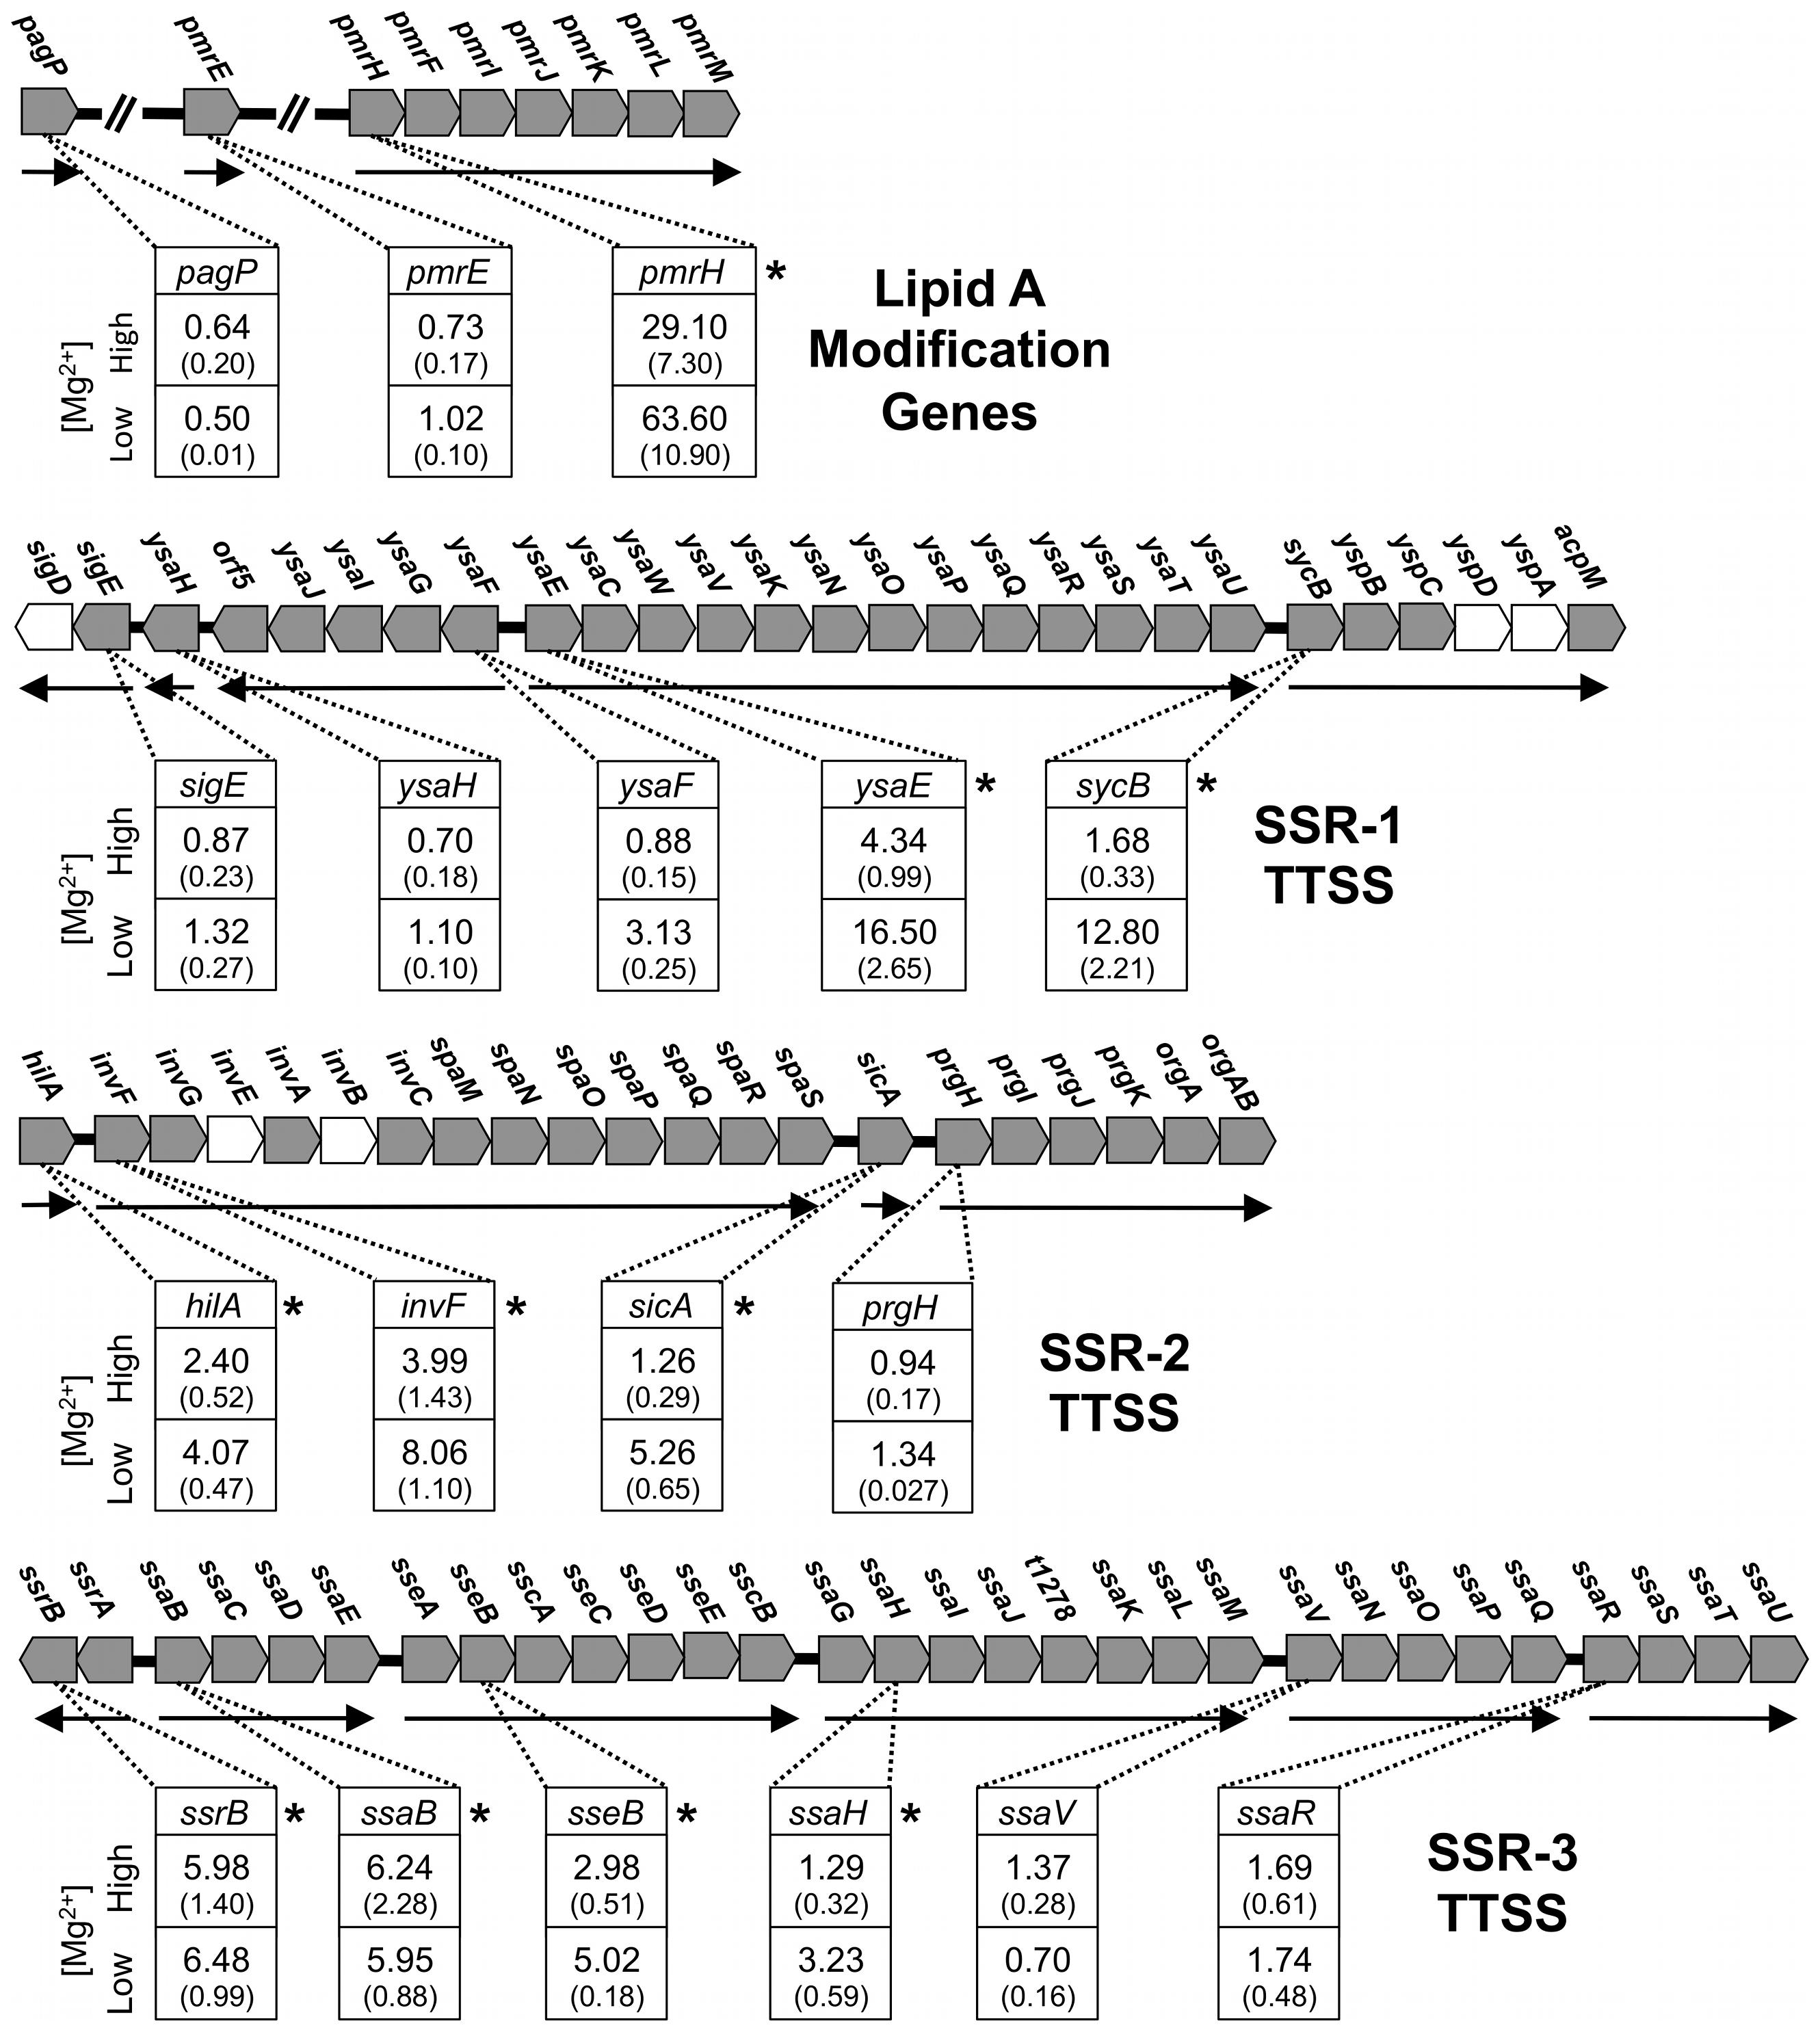 Quantitative PCR analysis of transcripts derived from genes involved in lipid A modifications in <i>S. glossinidius</i>.